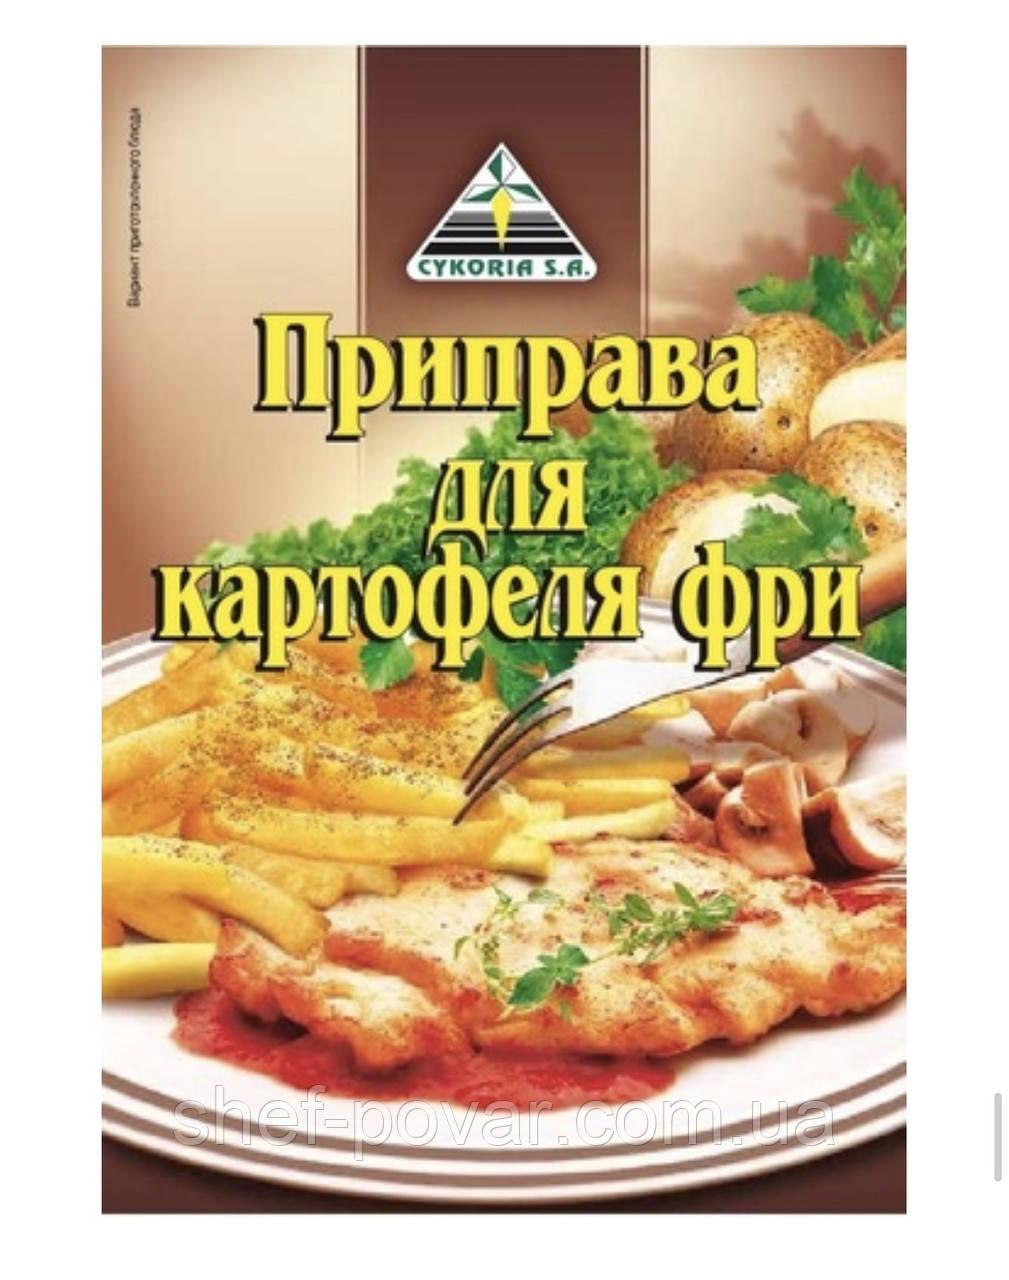 Приправа для картофеля фри 40гр ТМ «Cykoria s. a.»